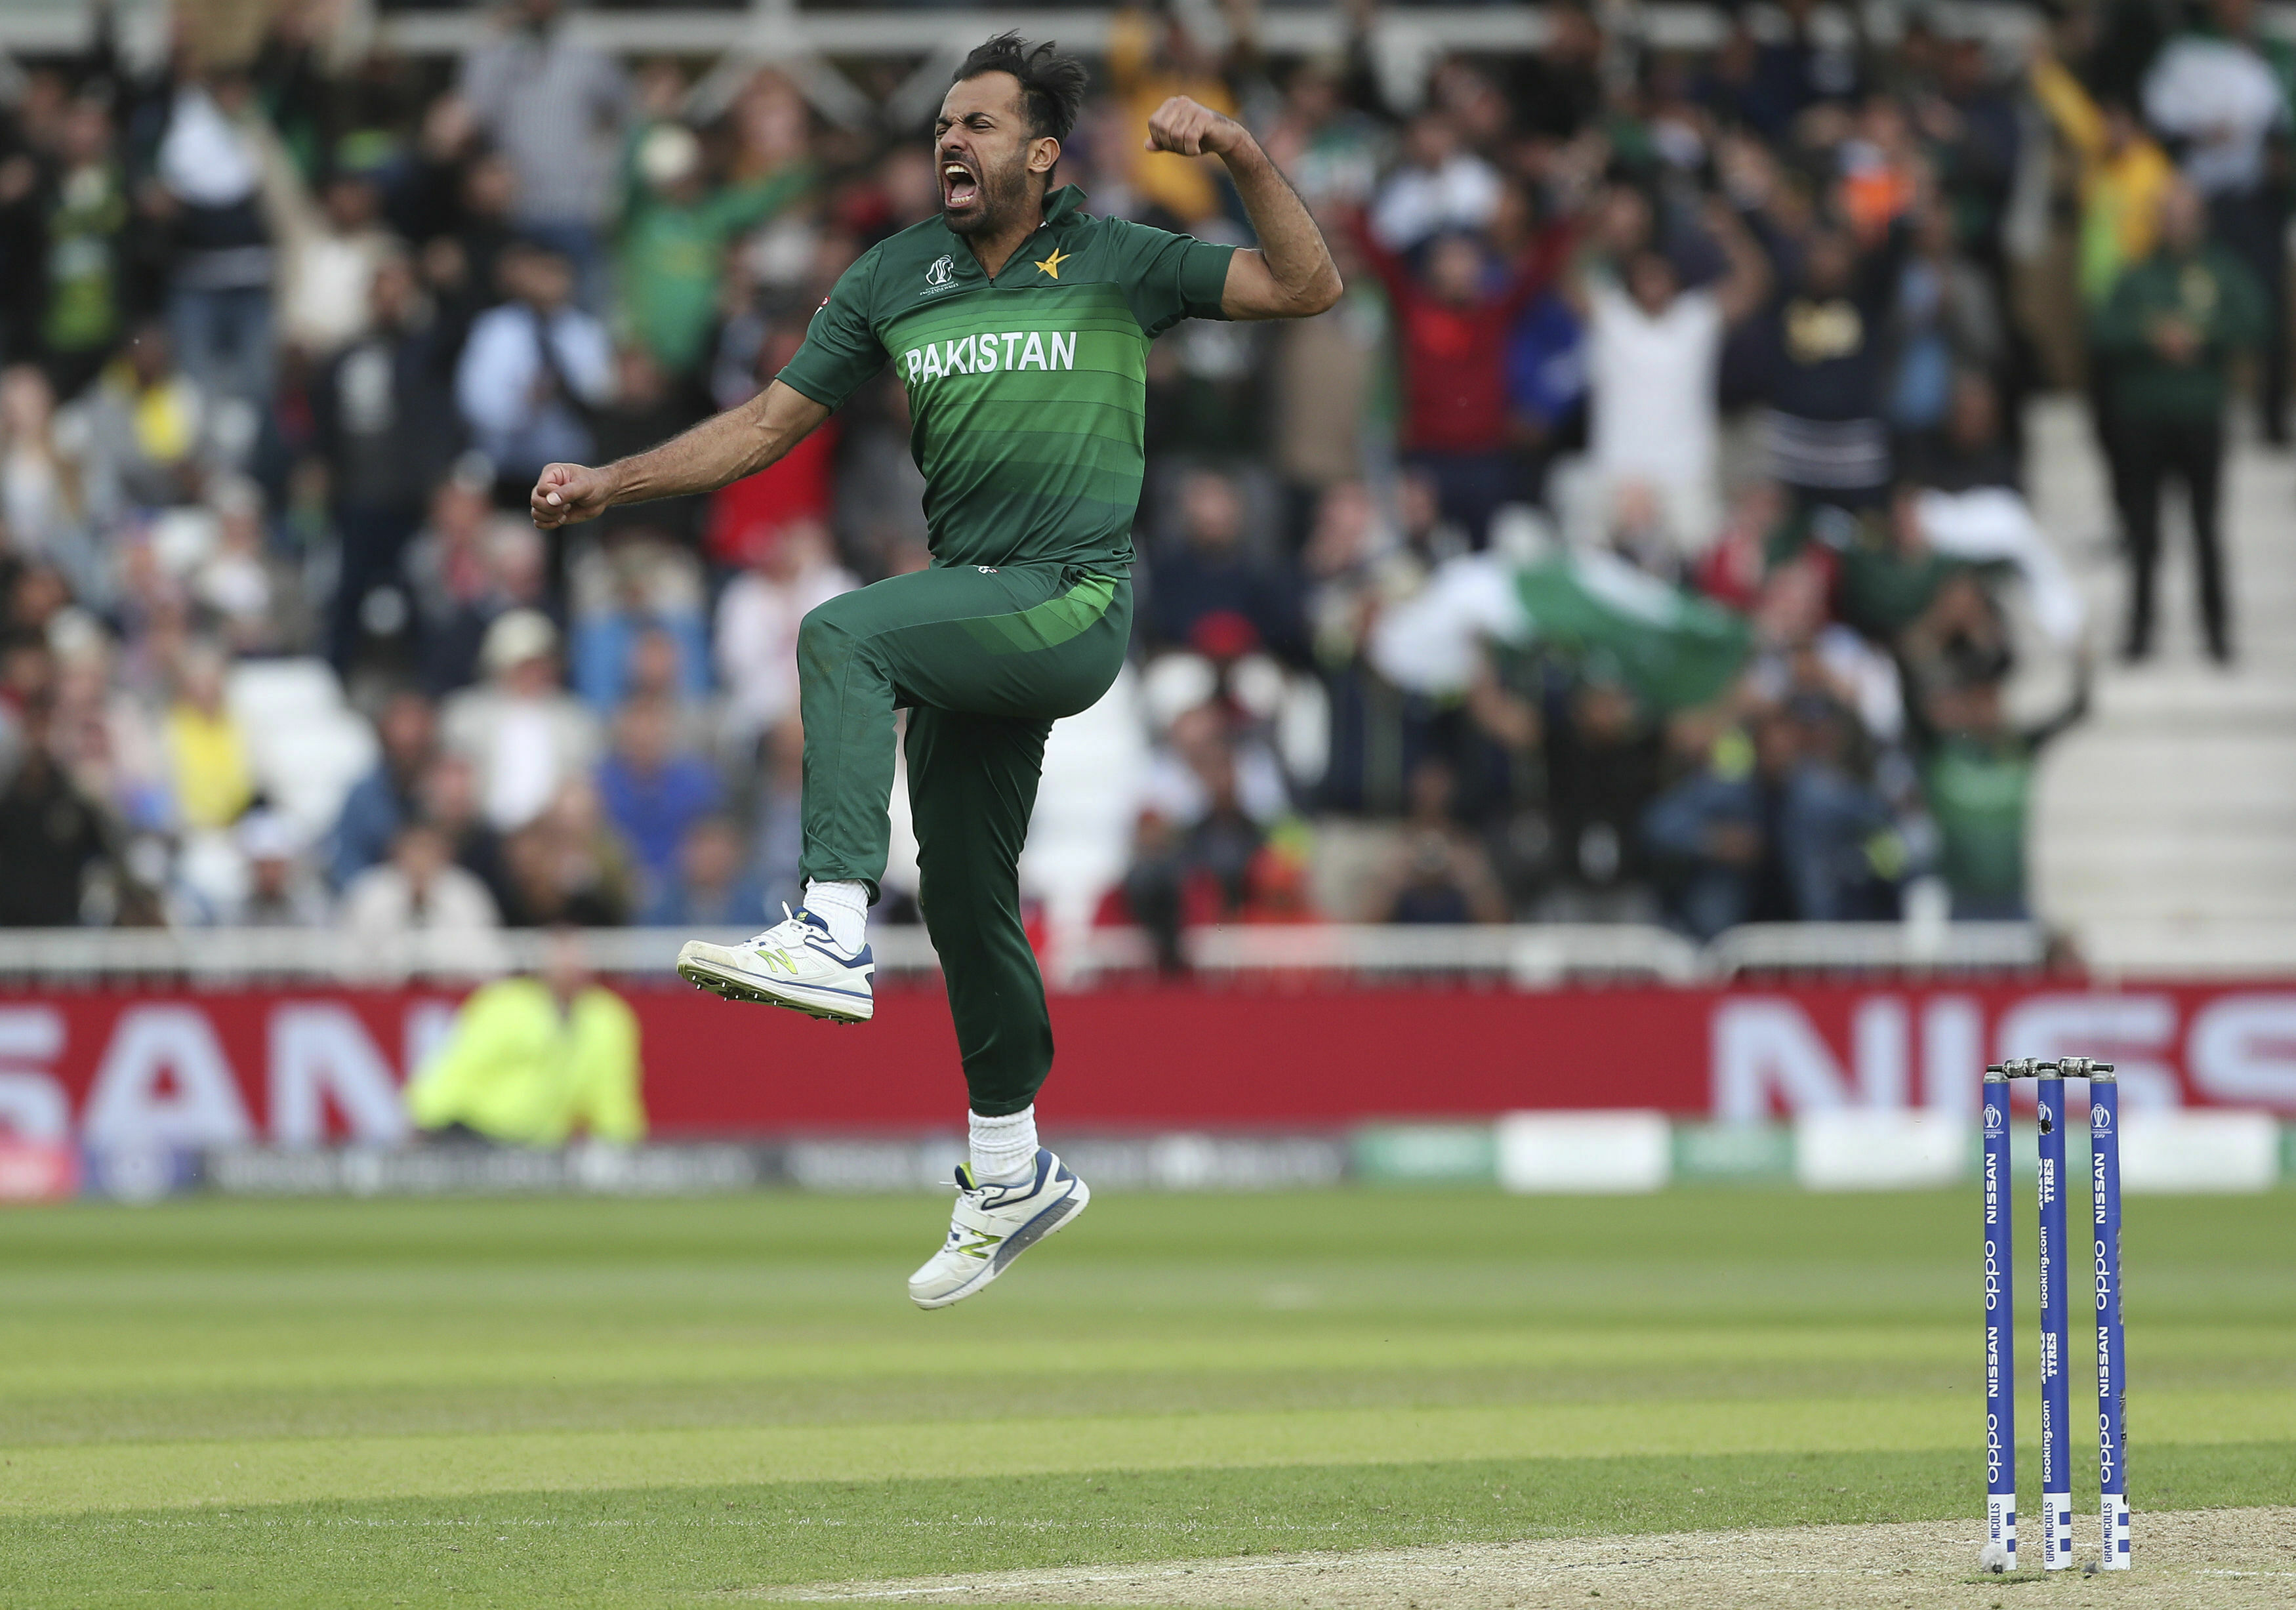 Pakistan's Wahab Riaz celebrates taking the wicket of England's Chris Woakes at Trent Bridge on June 3.